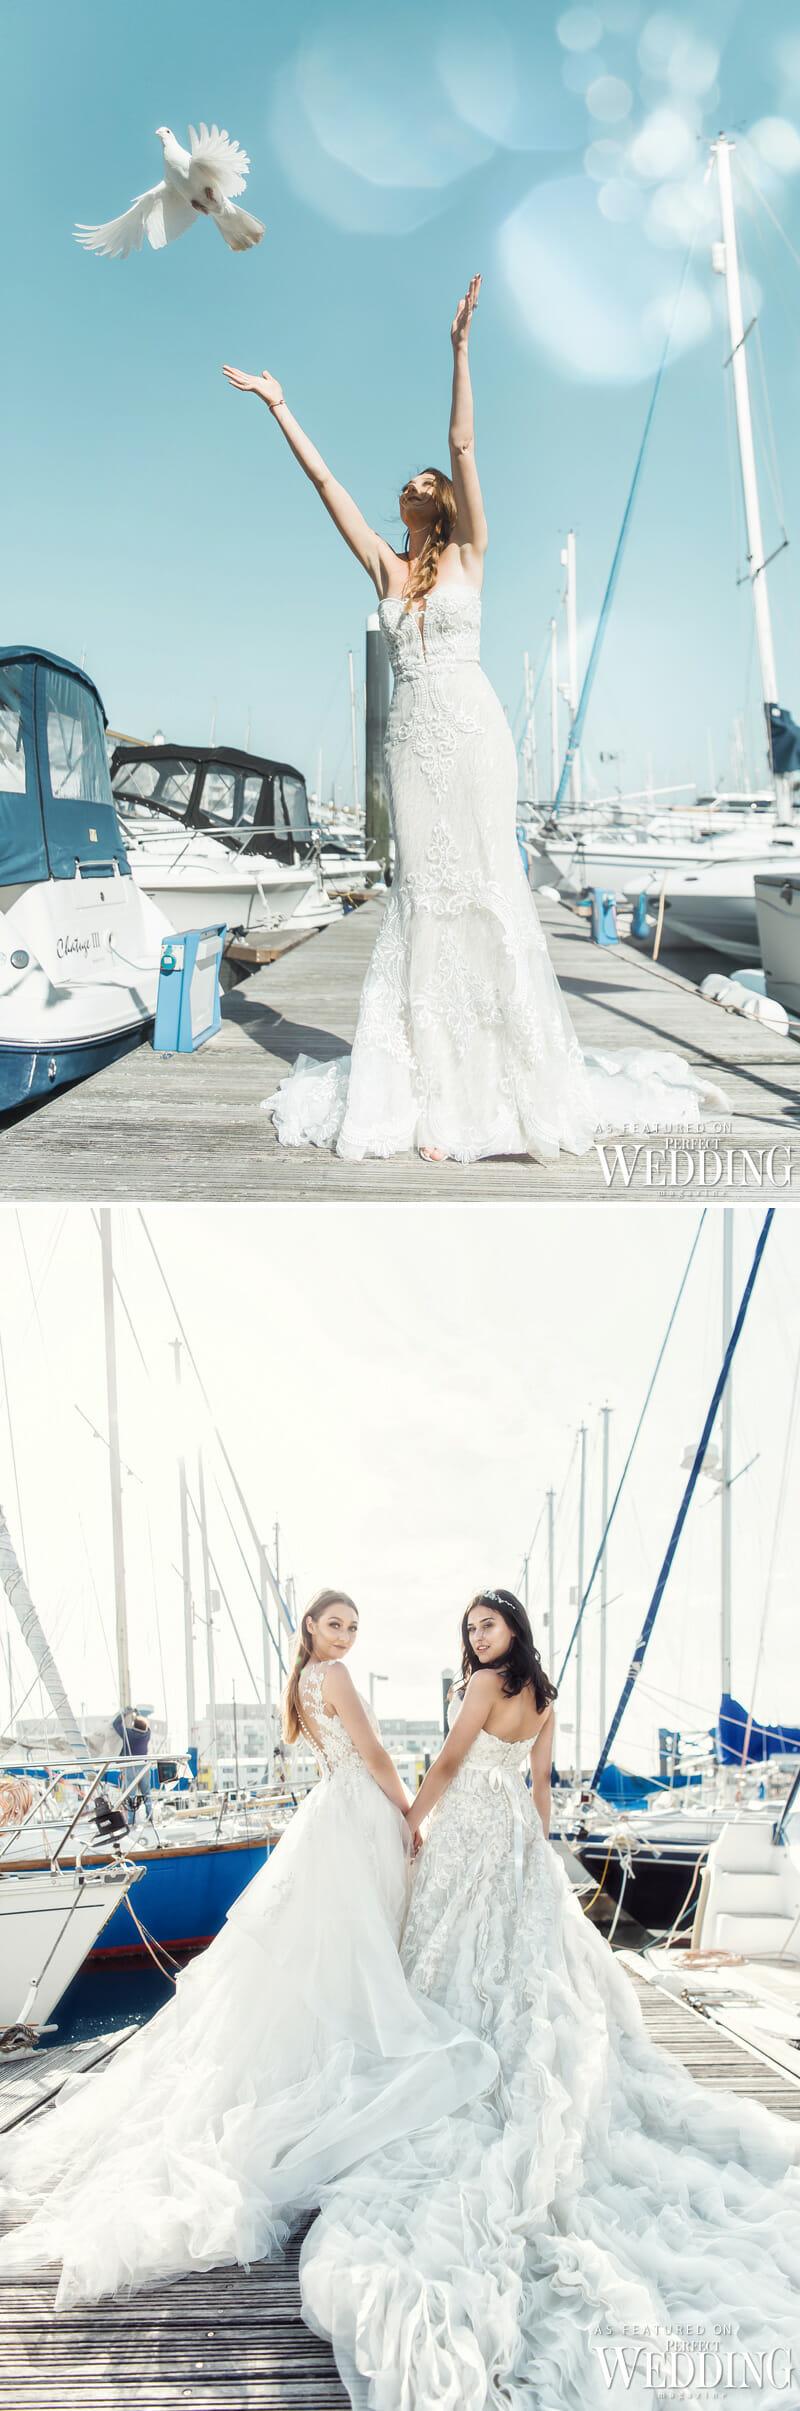 Summer Wedding Gowns, Wedding by the Sea, Bridal style Shoot, Fashion Shoot, UK Wedding Vendors, Perfect Wedding Magazine, Perfect Wedding Blog, Bridal Fashion, Ian Stuart,